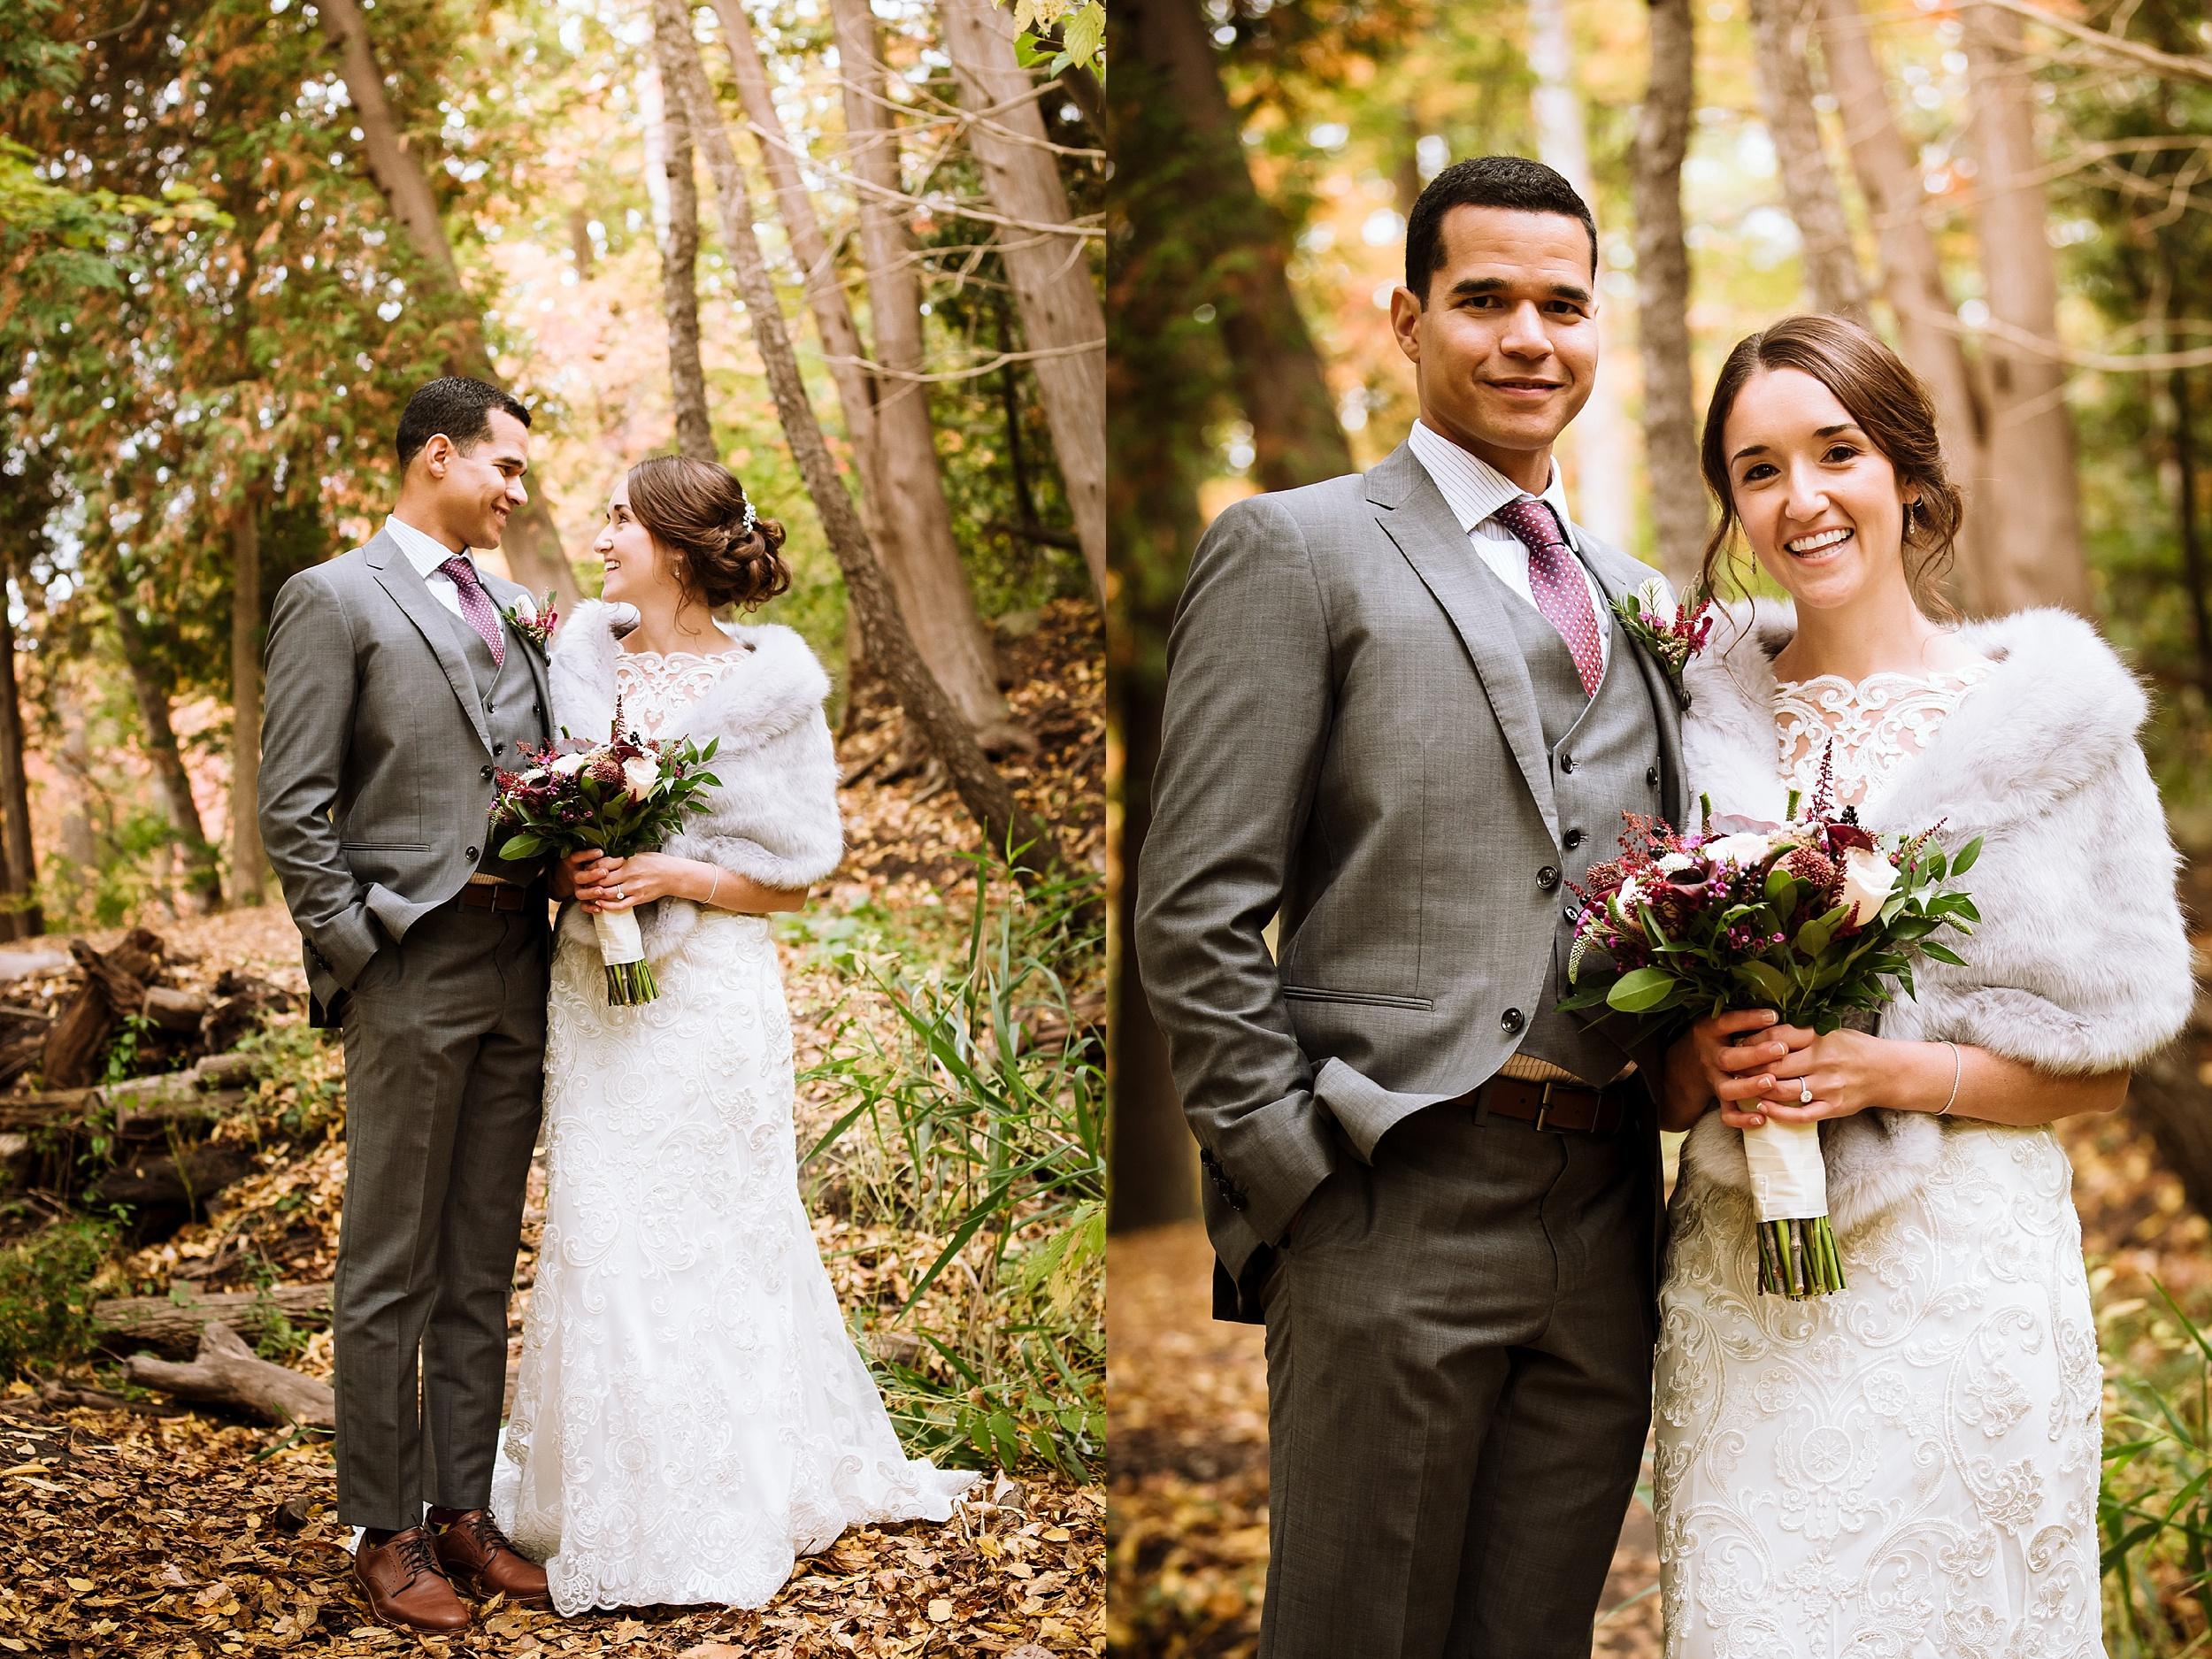 Toronto_Wedding_Photographer_Edwards_Gardens_0030.jpg